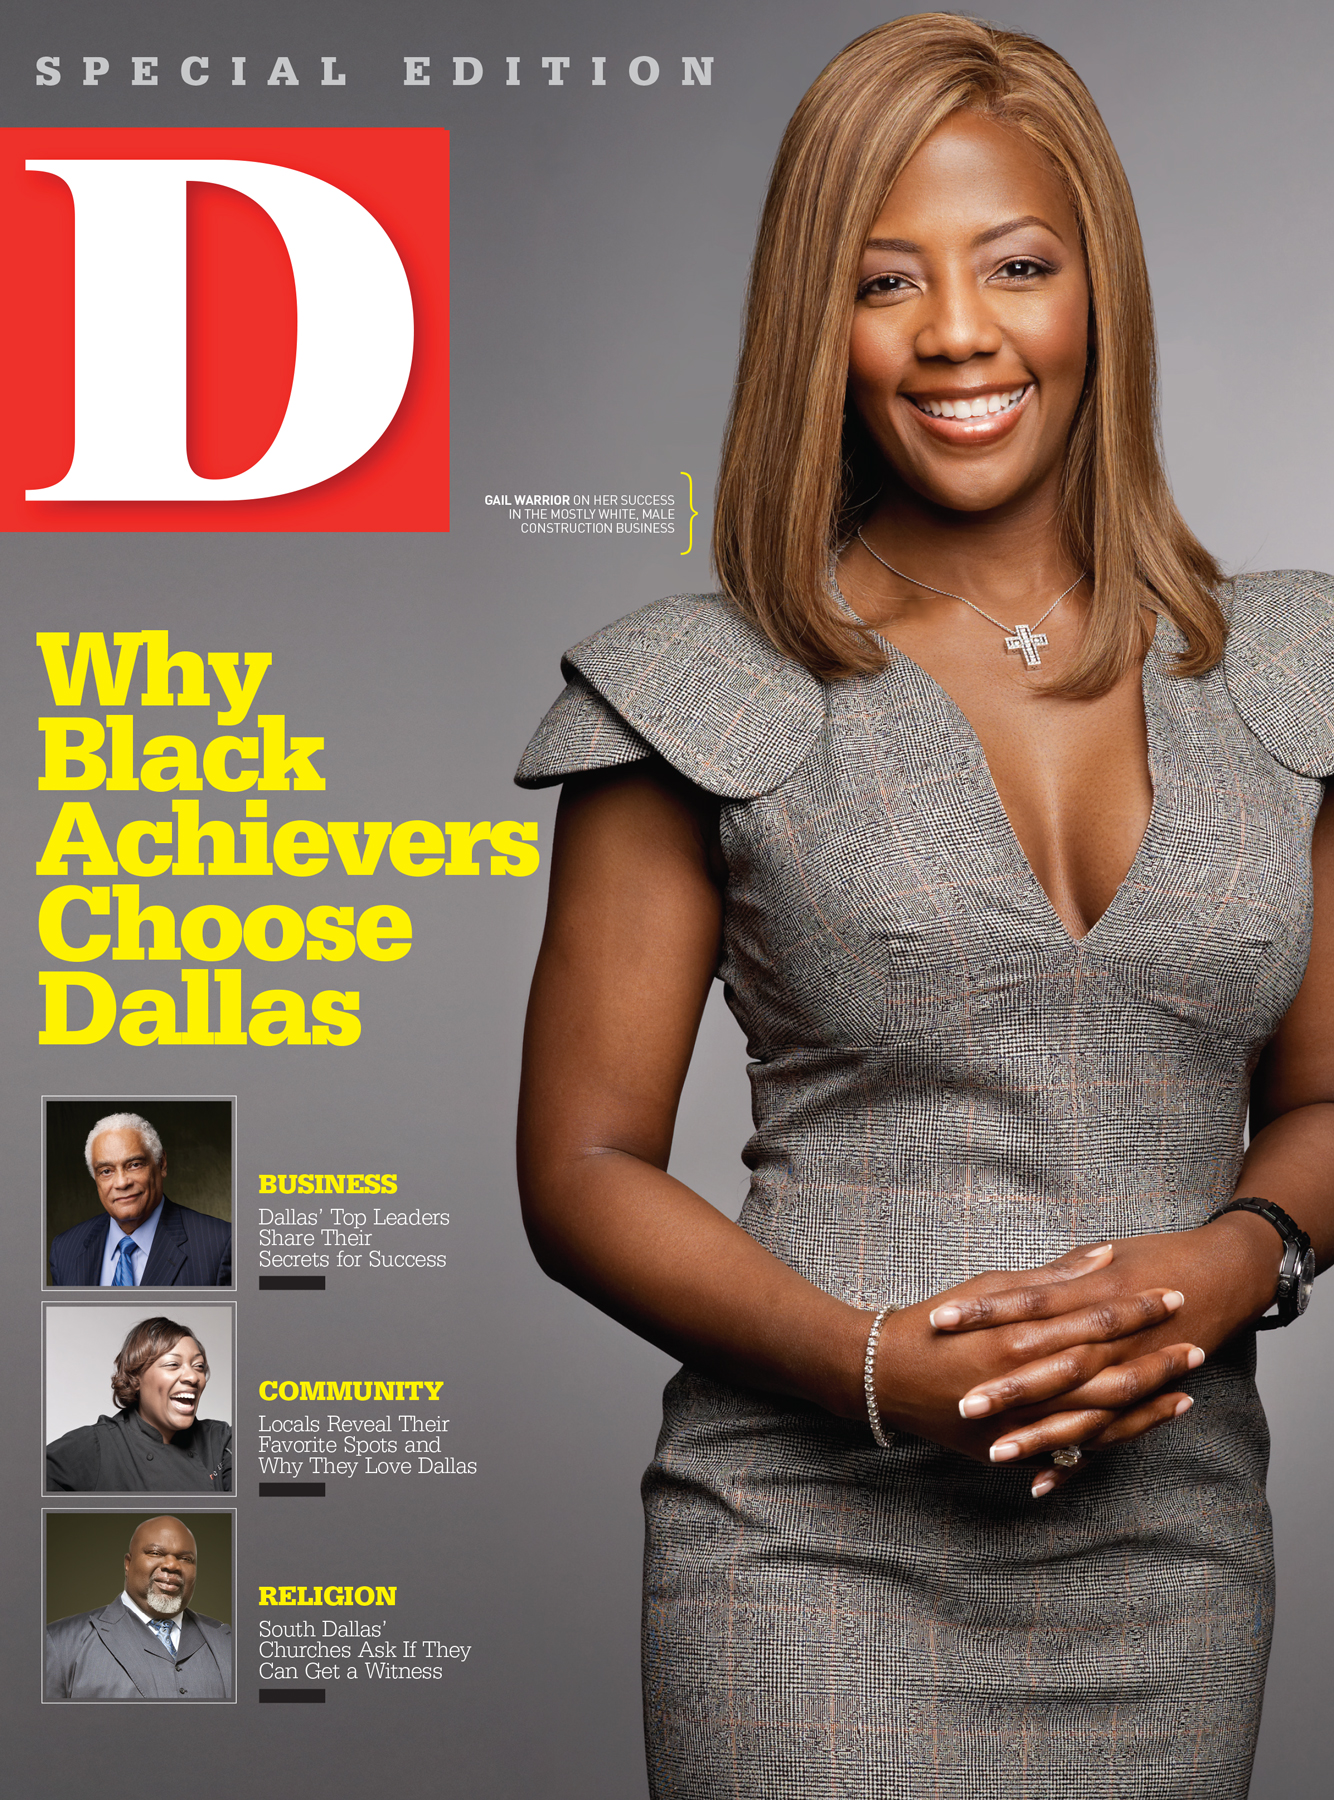 Why Black Achievers Chose Dallas 2011 cover